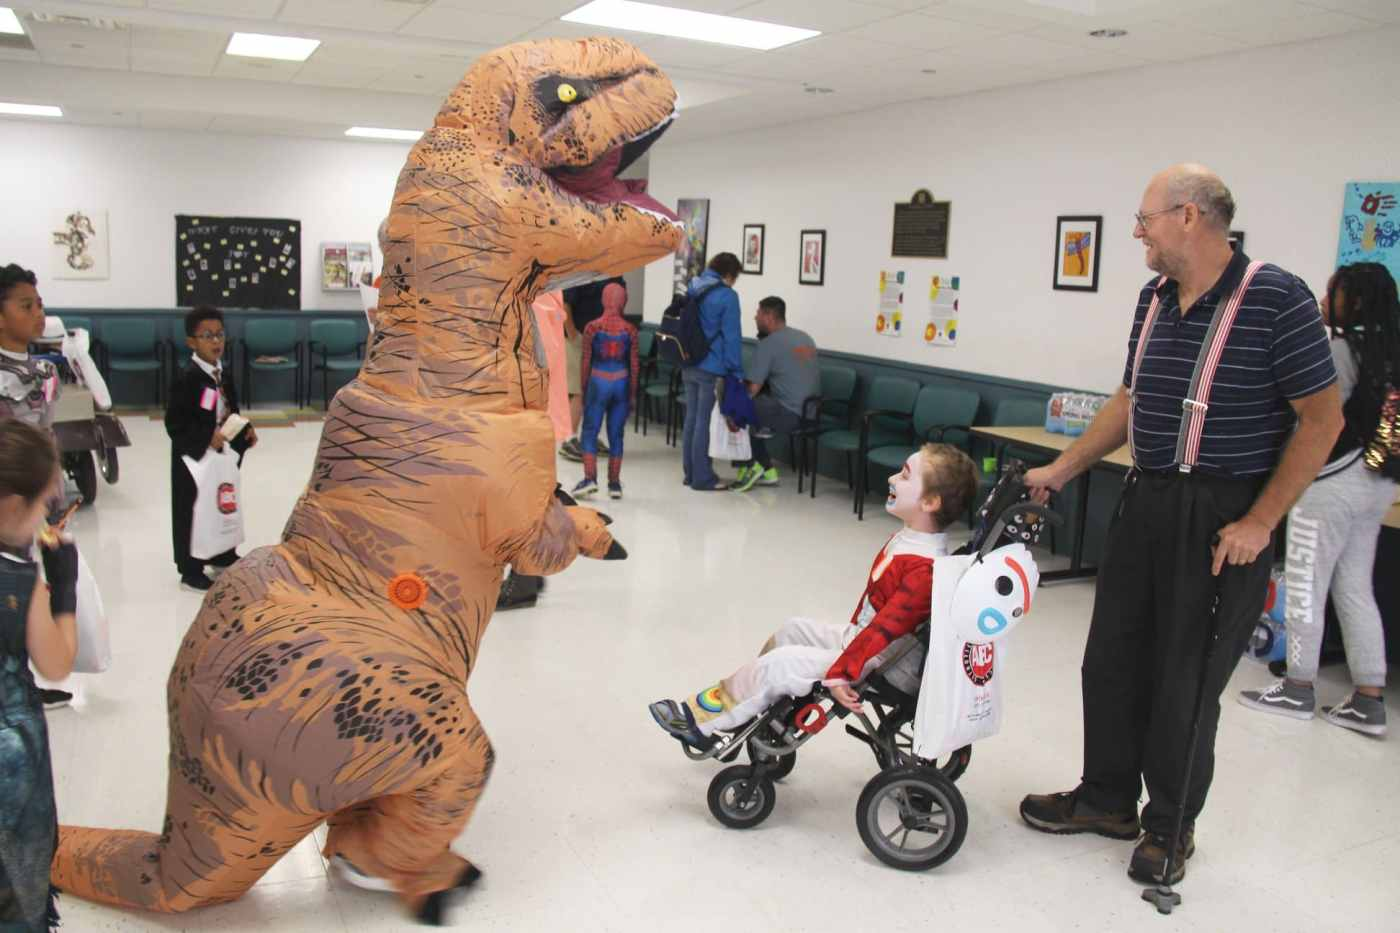 Children and dinosaurs